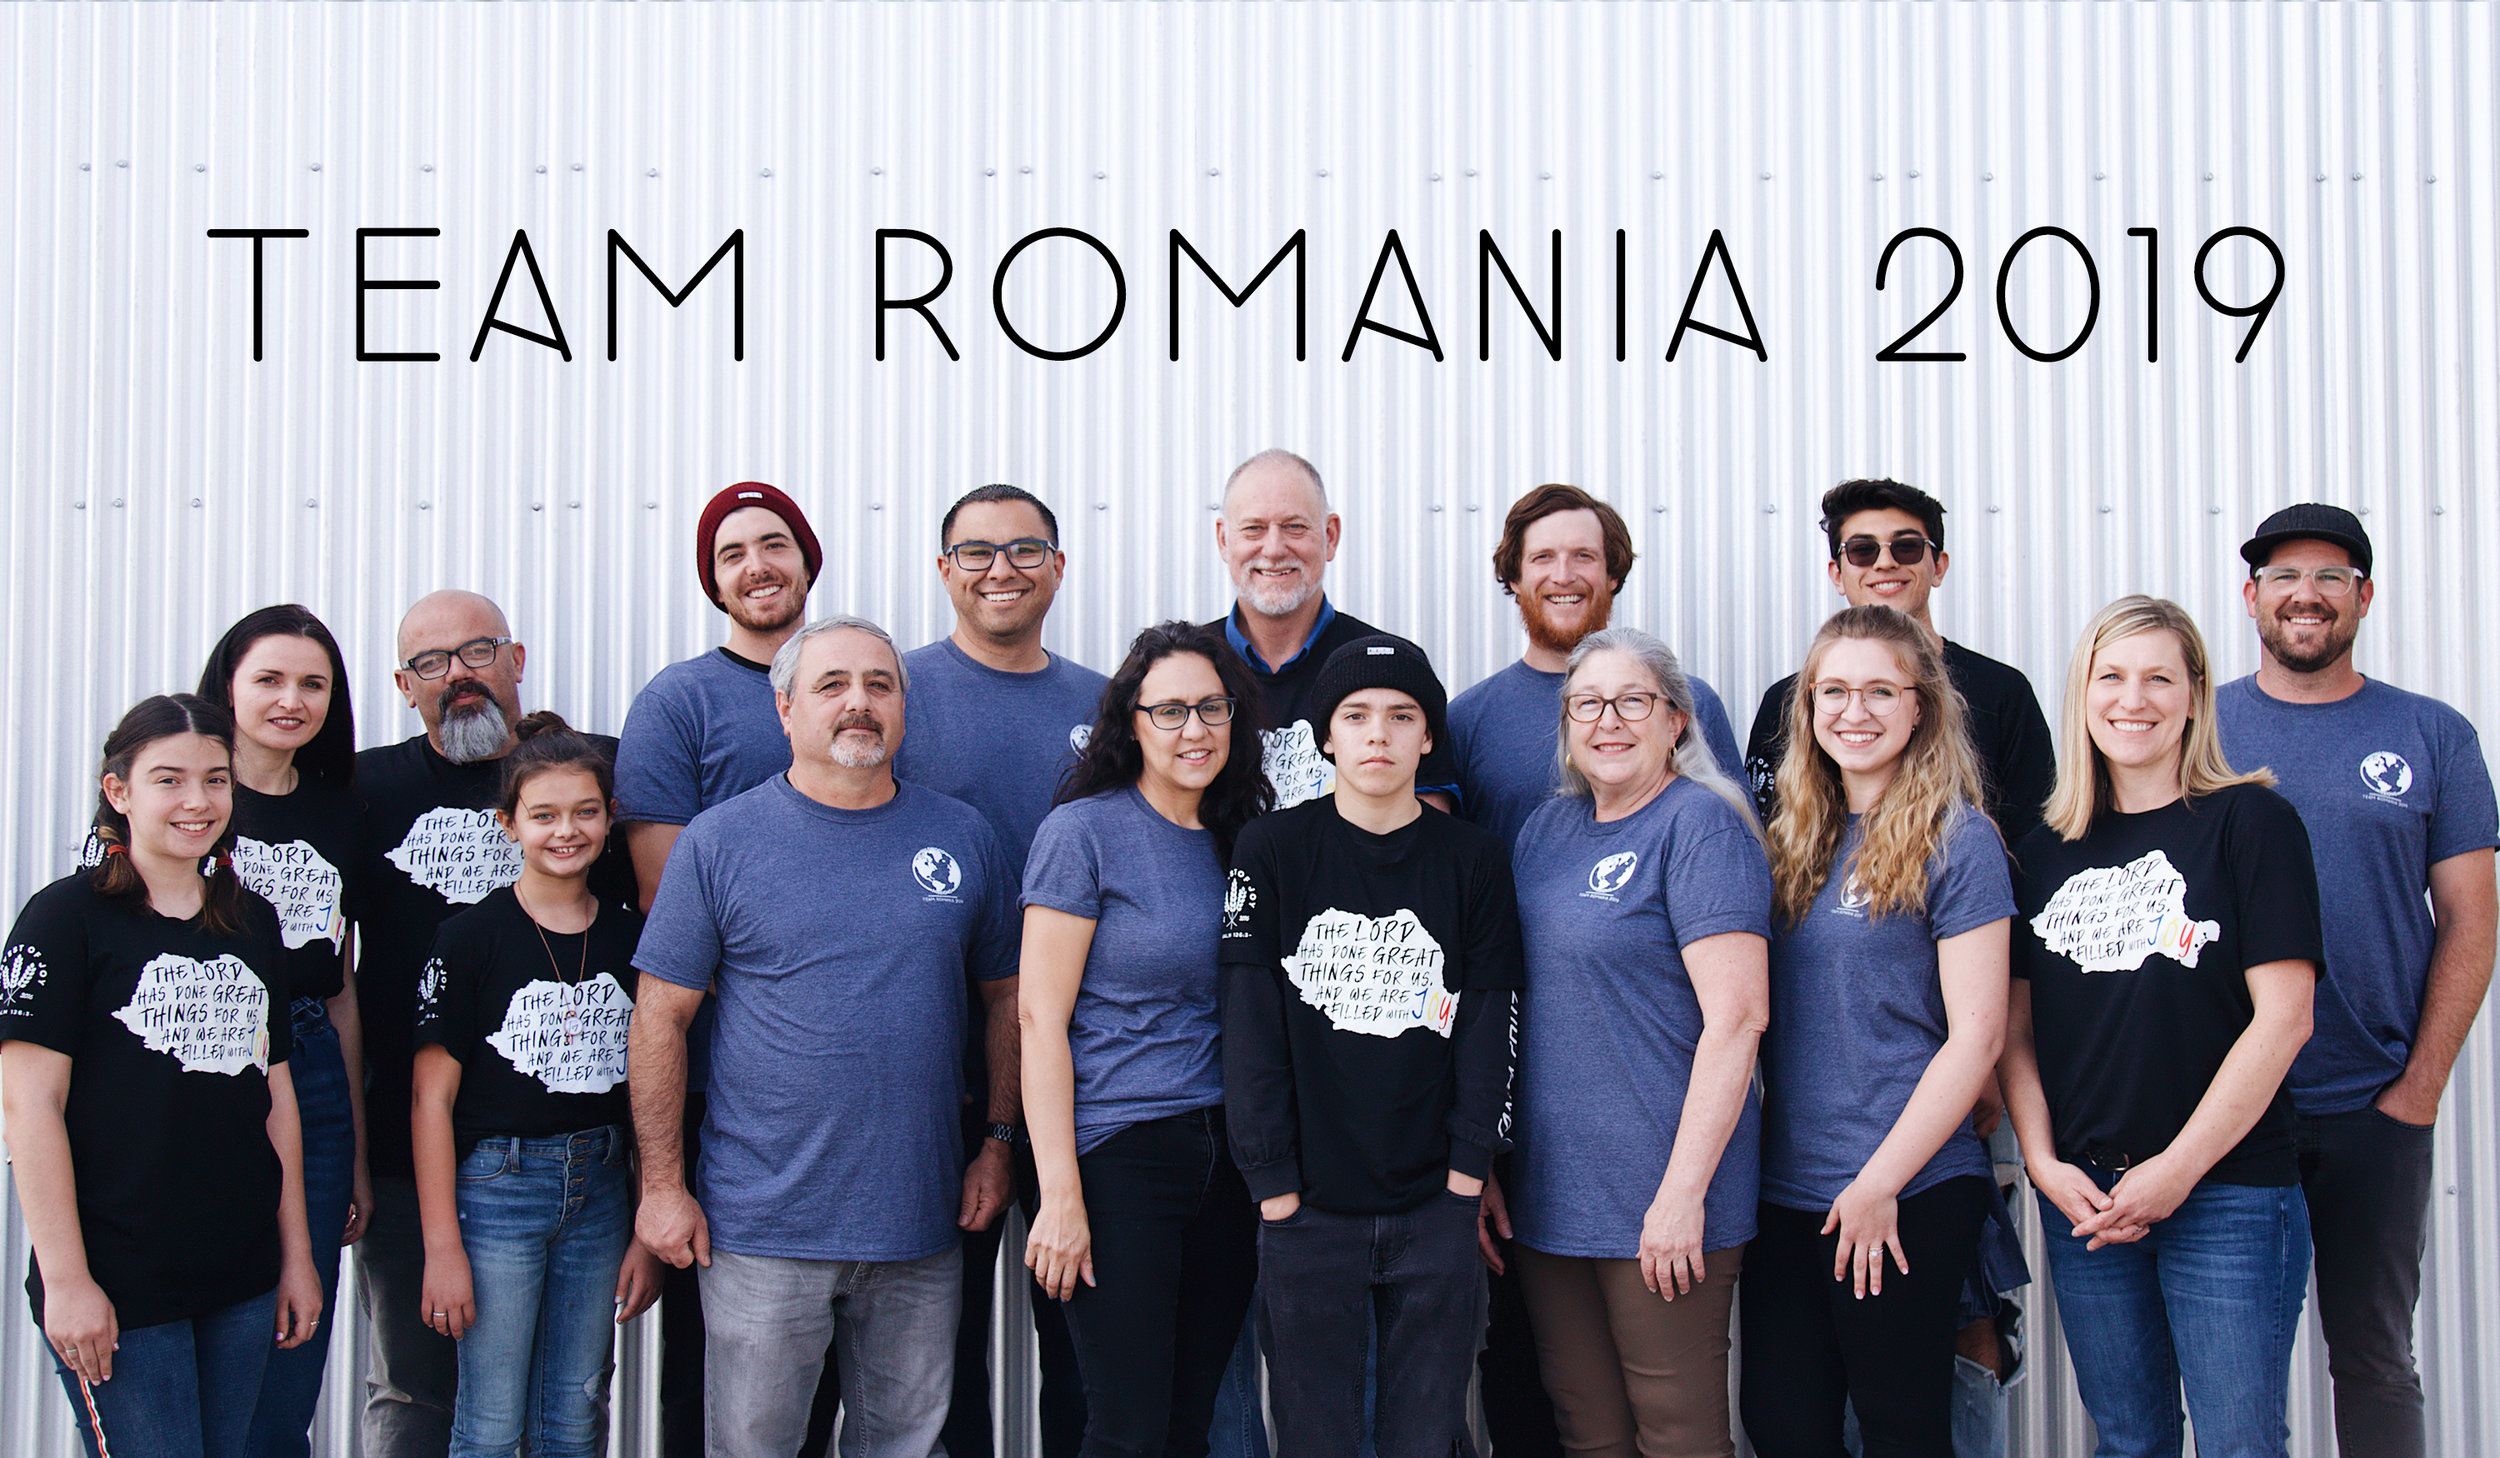 teamromania2019.jpg